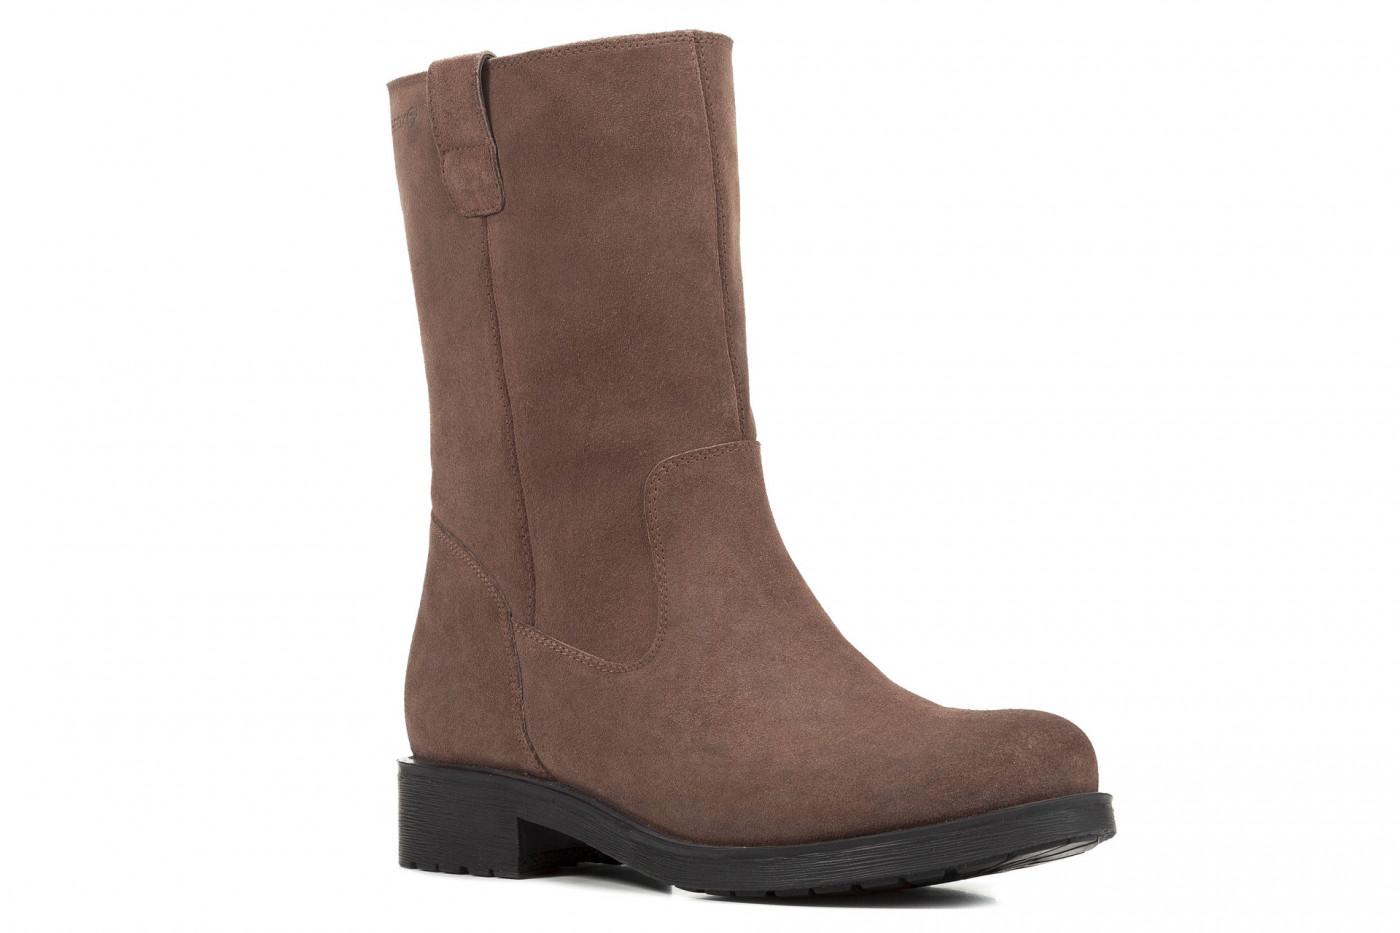 ama de casa compañera de clases Jarra  Women's boots GEOX RAWELLE